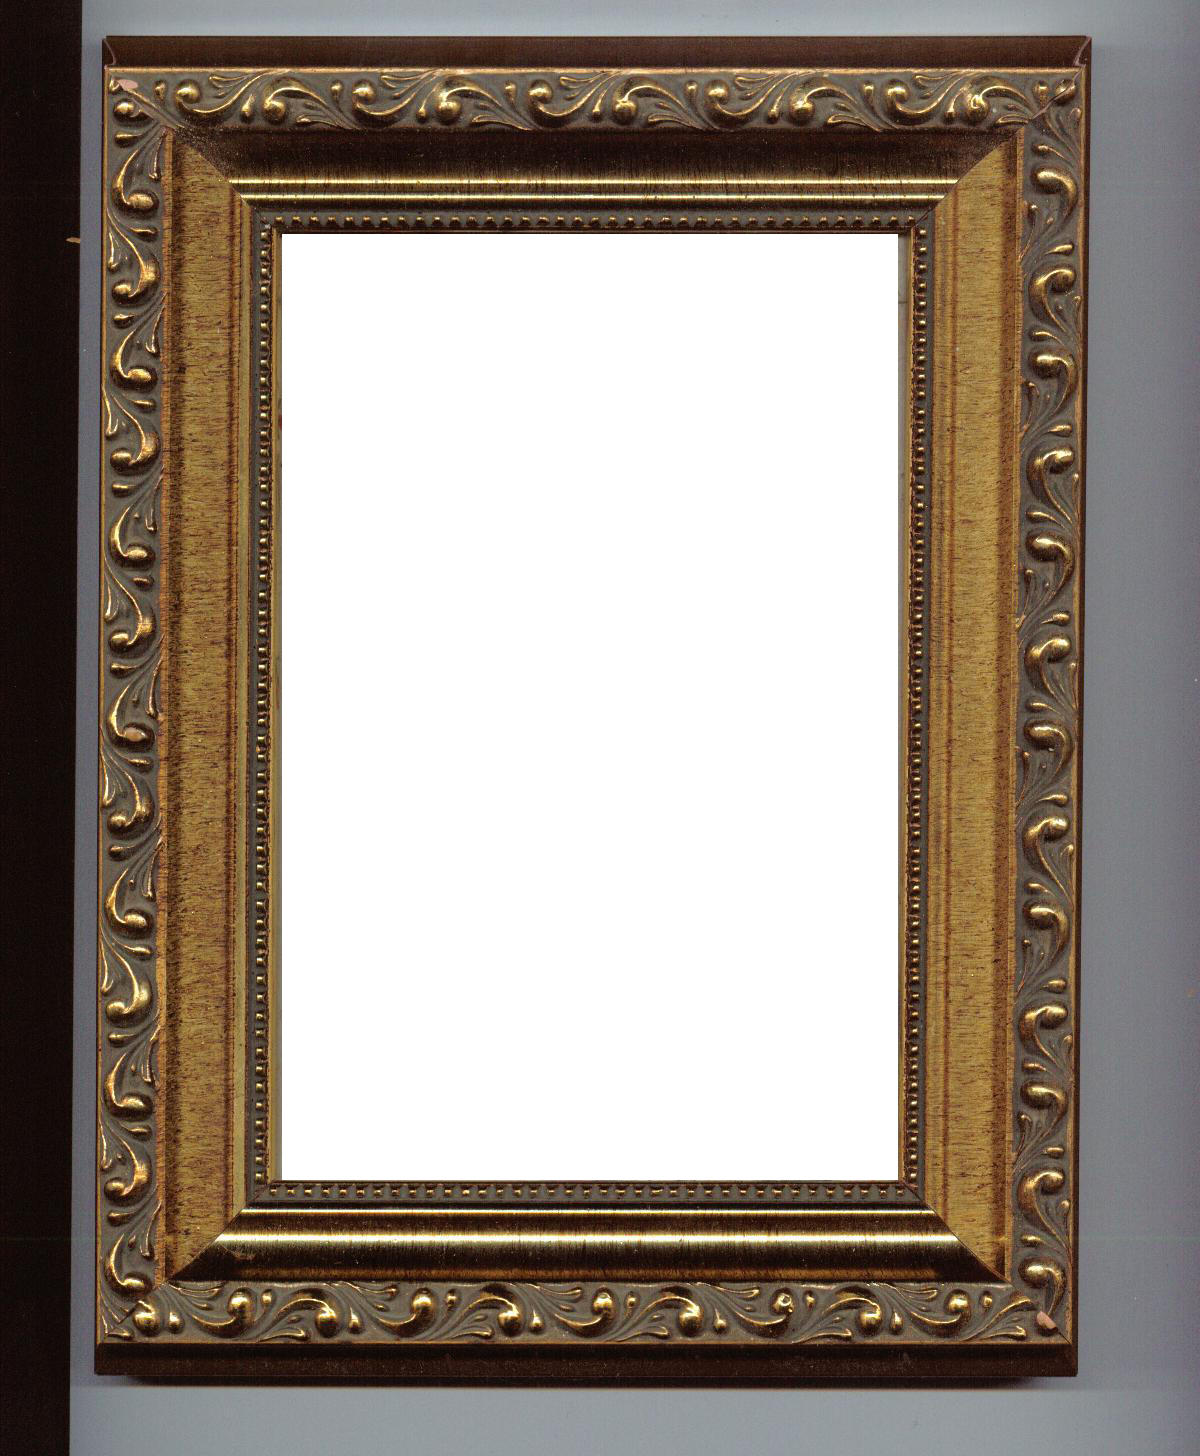 scanned-stock frame 5 by scanned-stock on DeviantArt